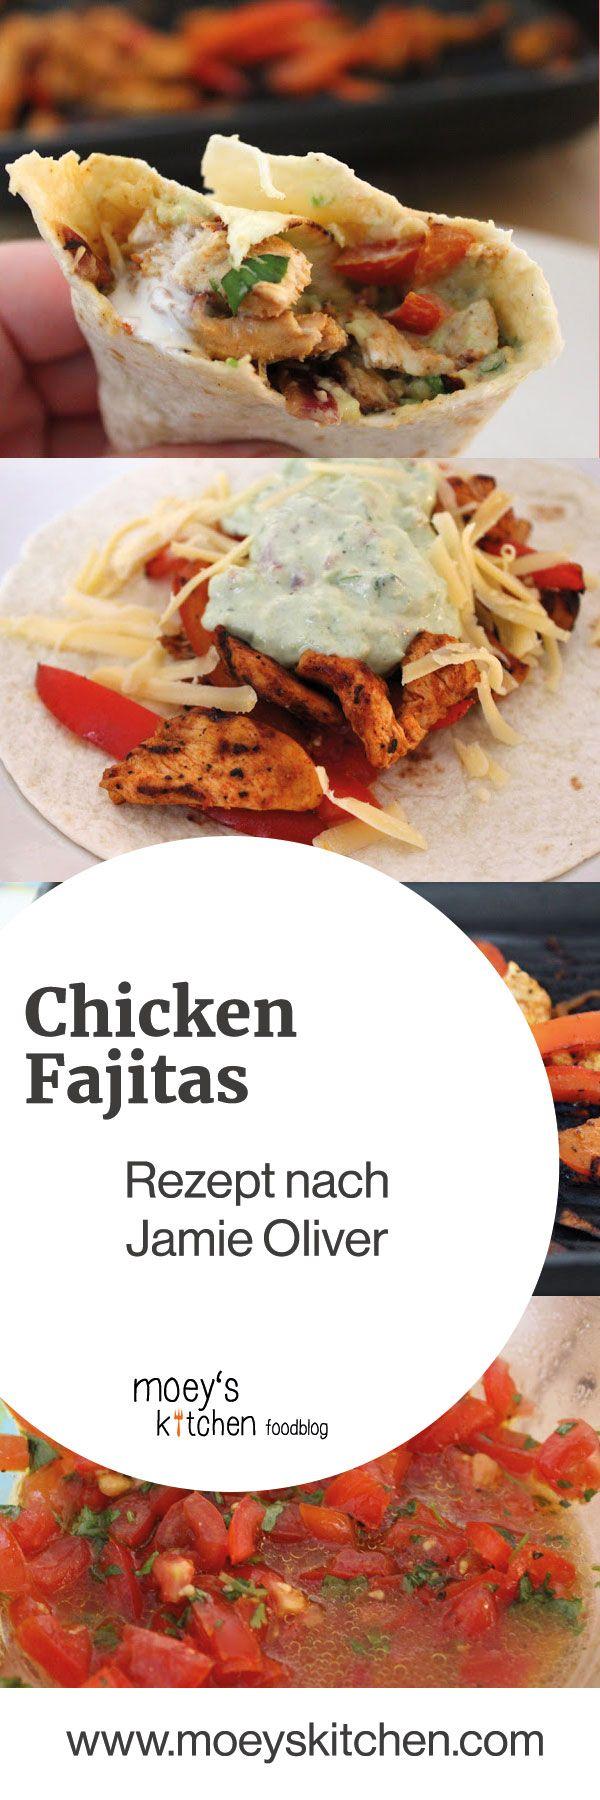 Photo of Chicken fajitas after Jamie Oliver